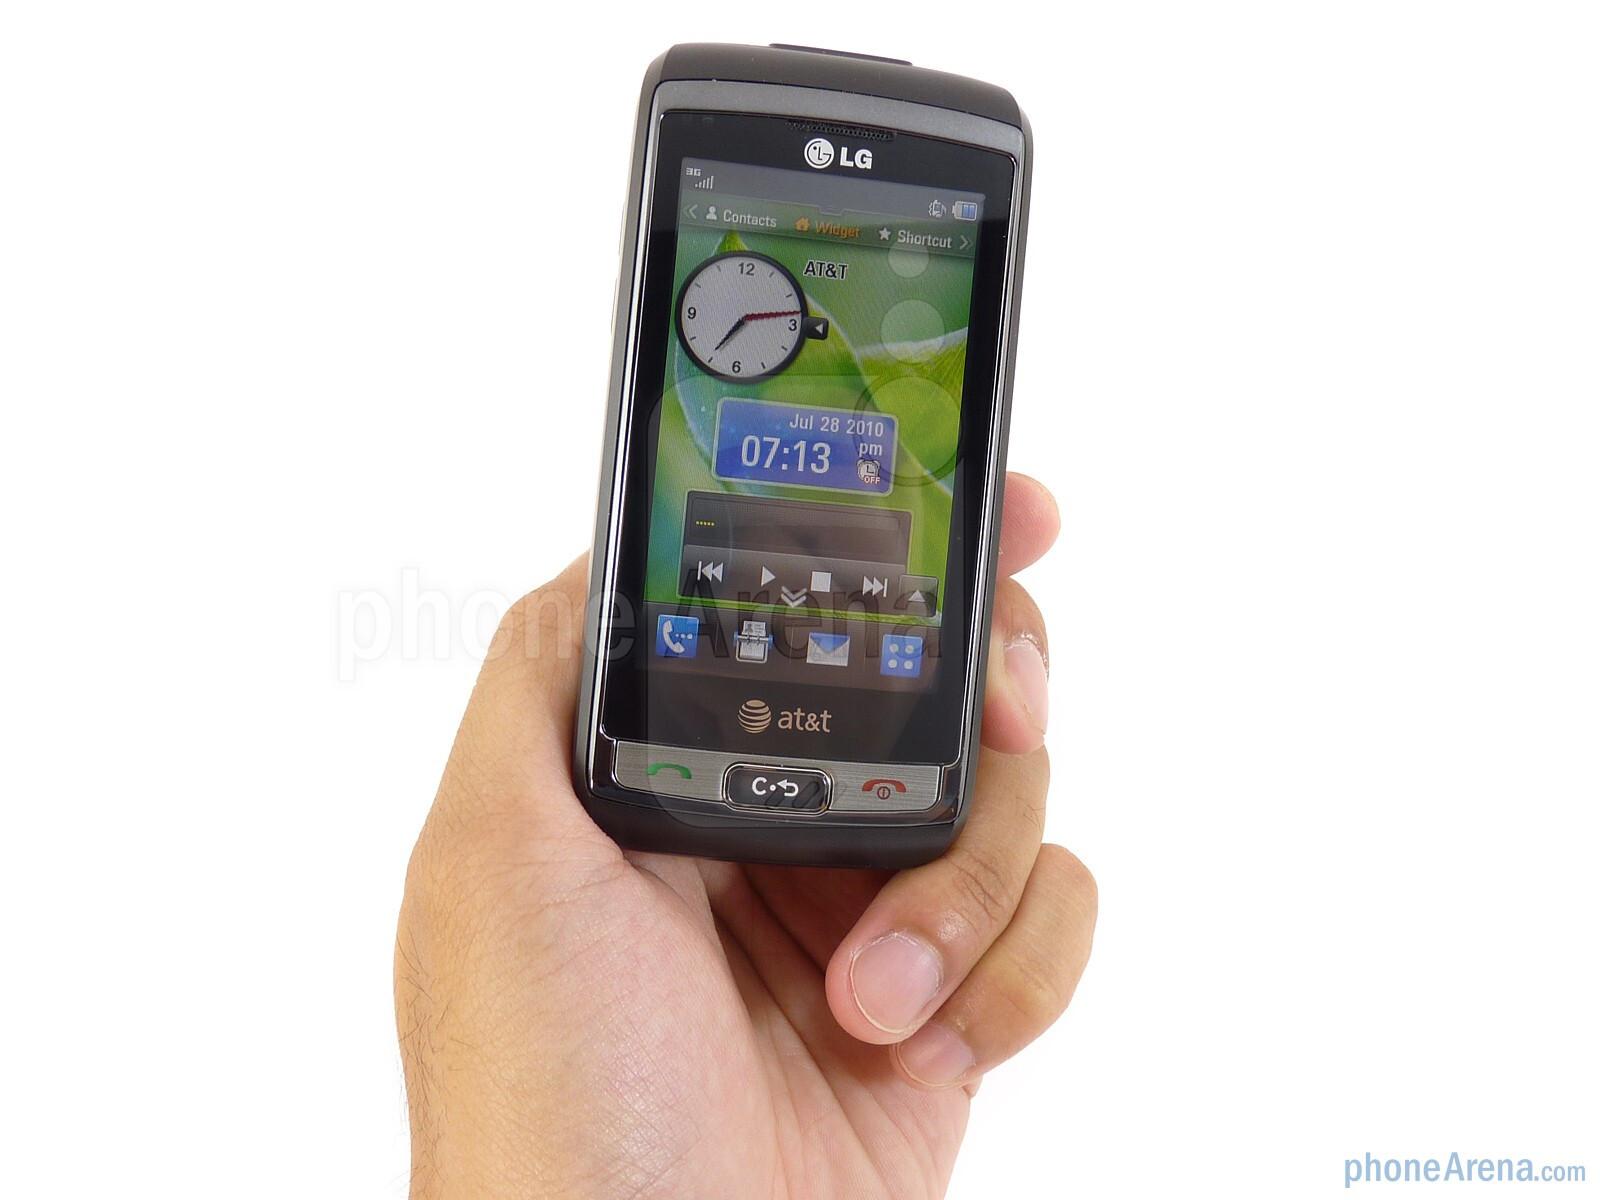 lg vu plus review rh phonearena com LG CU920 Unlocked AT&T LG CU920